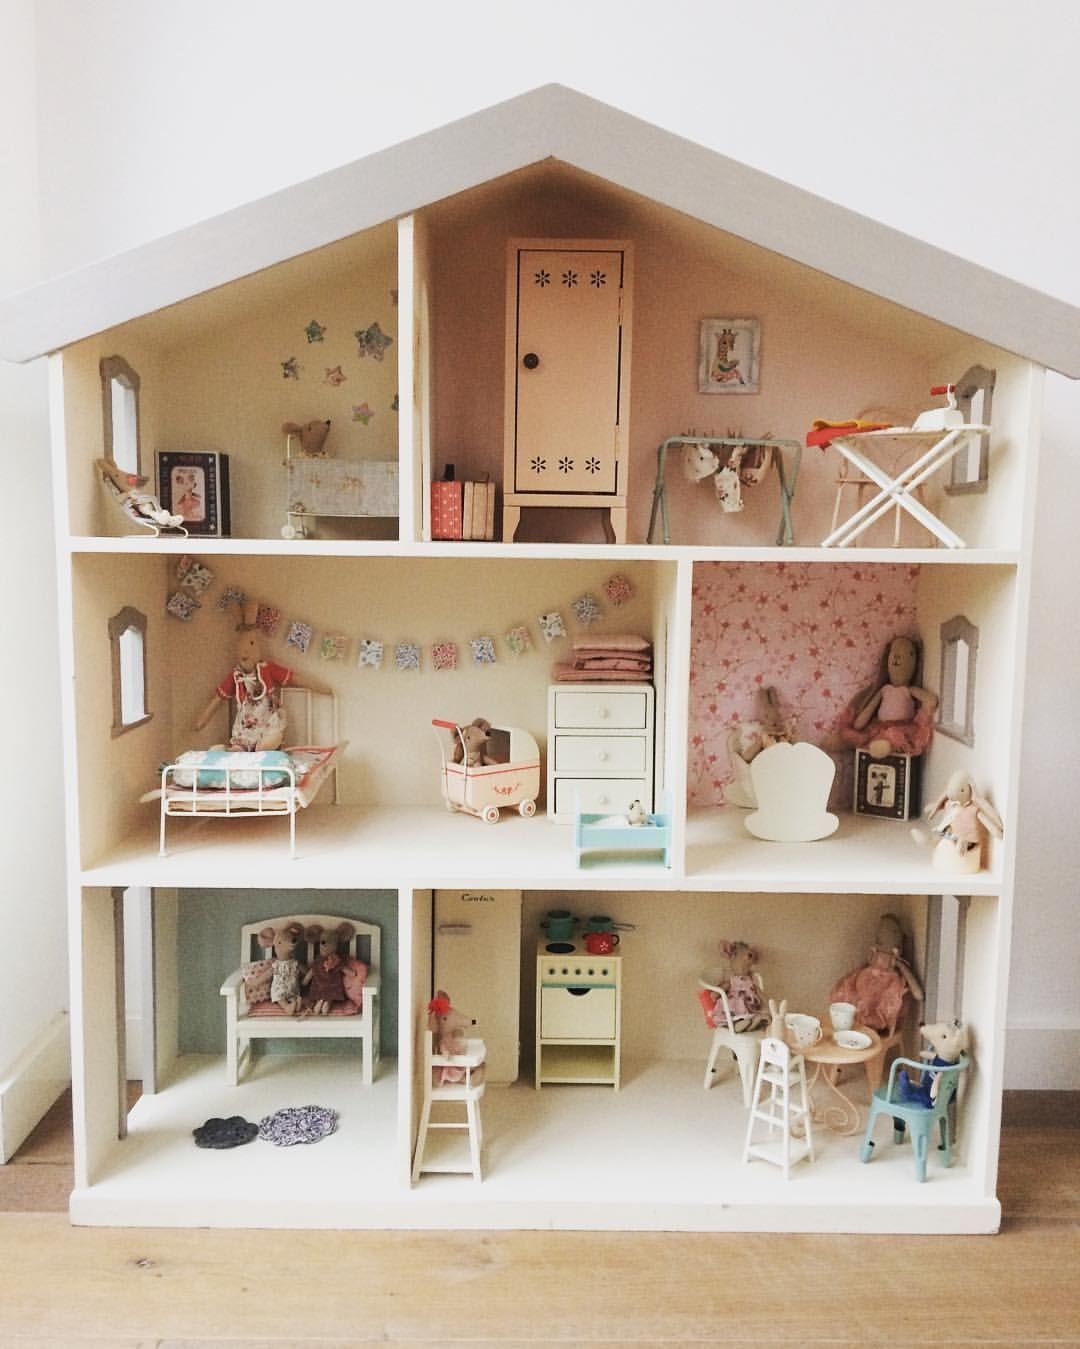 Baby Doll House Mini Doll House Play